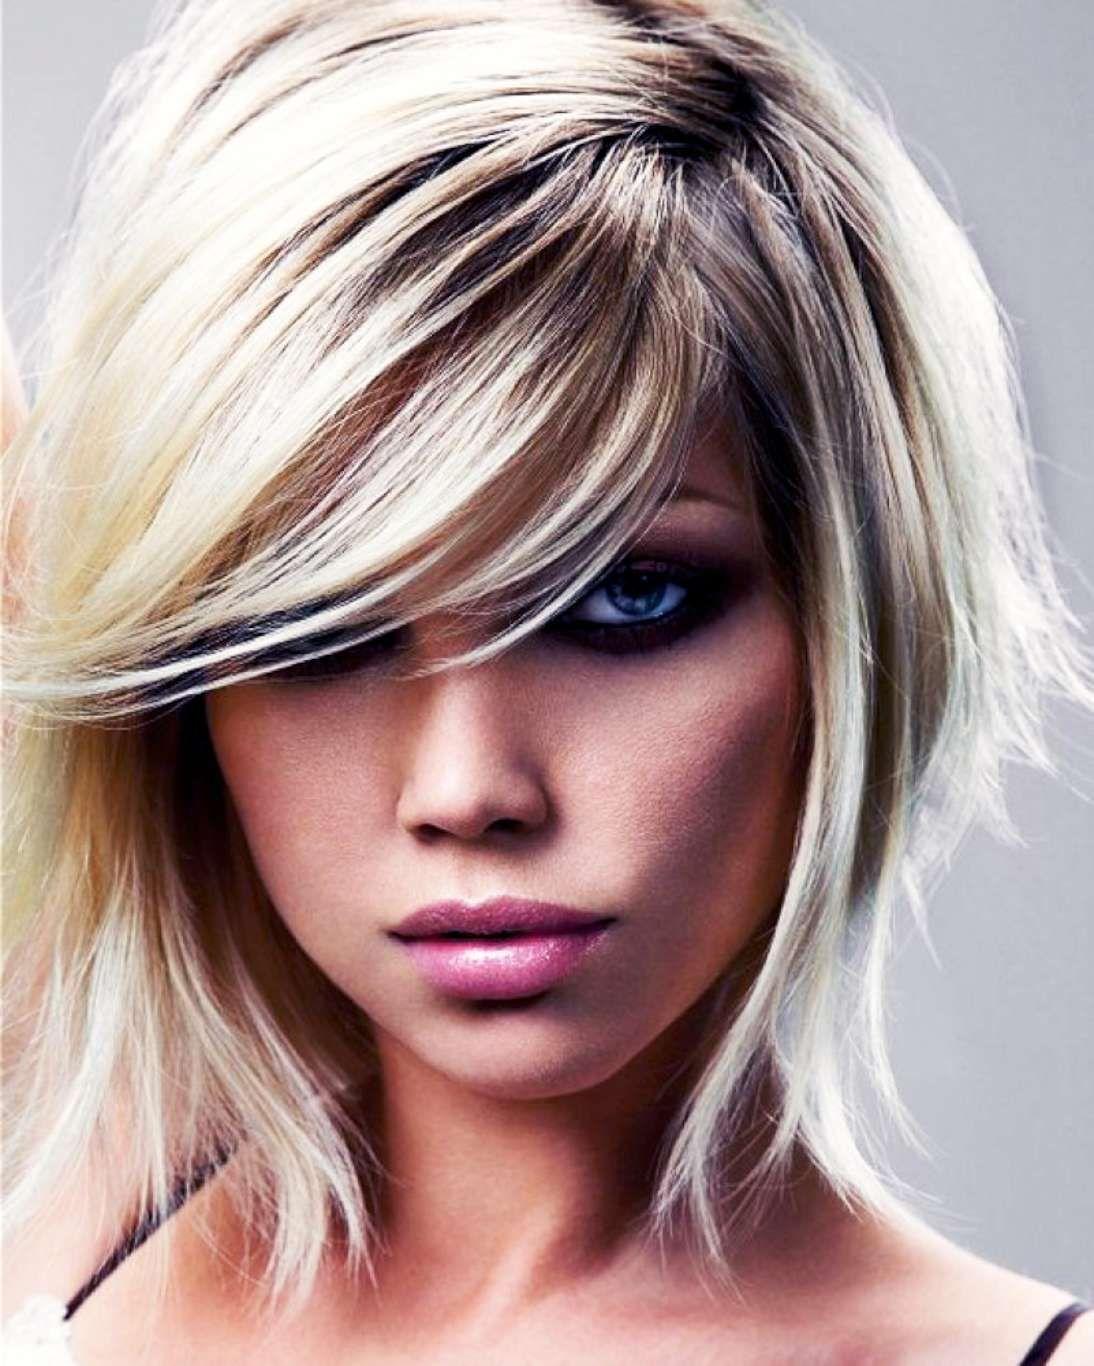 Haircuts for short women women hairstyle trendy u new